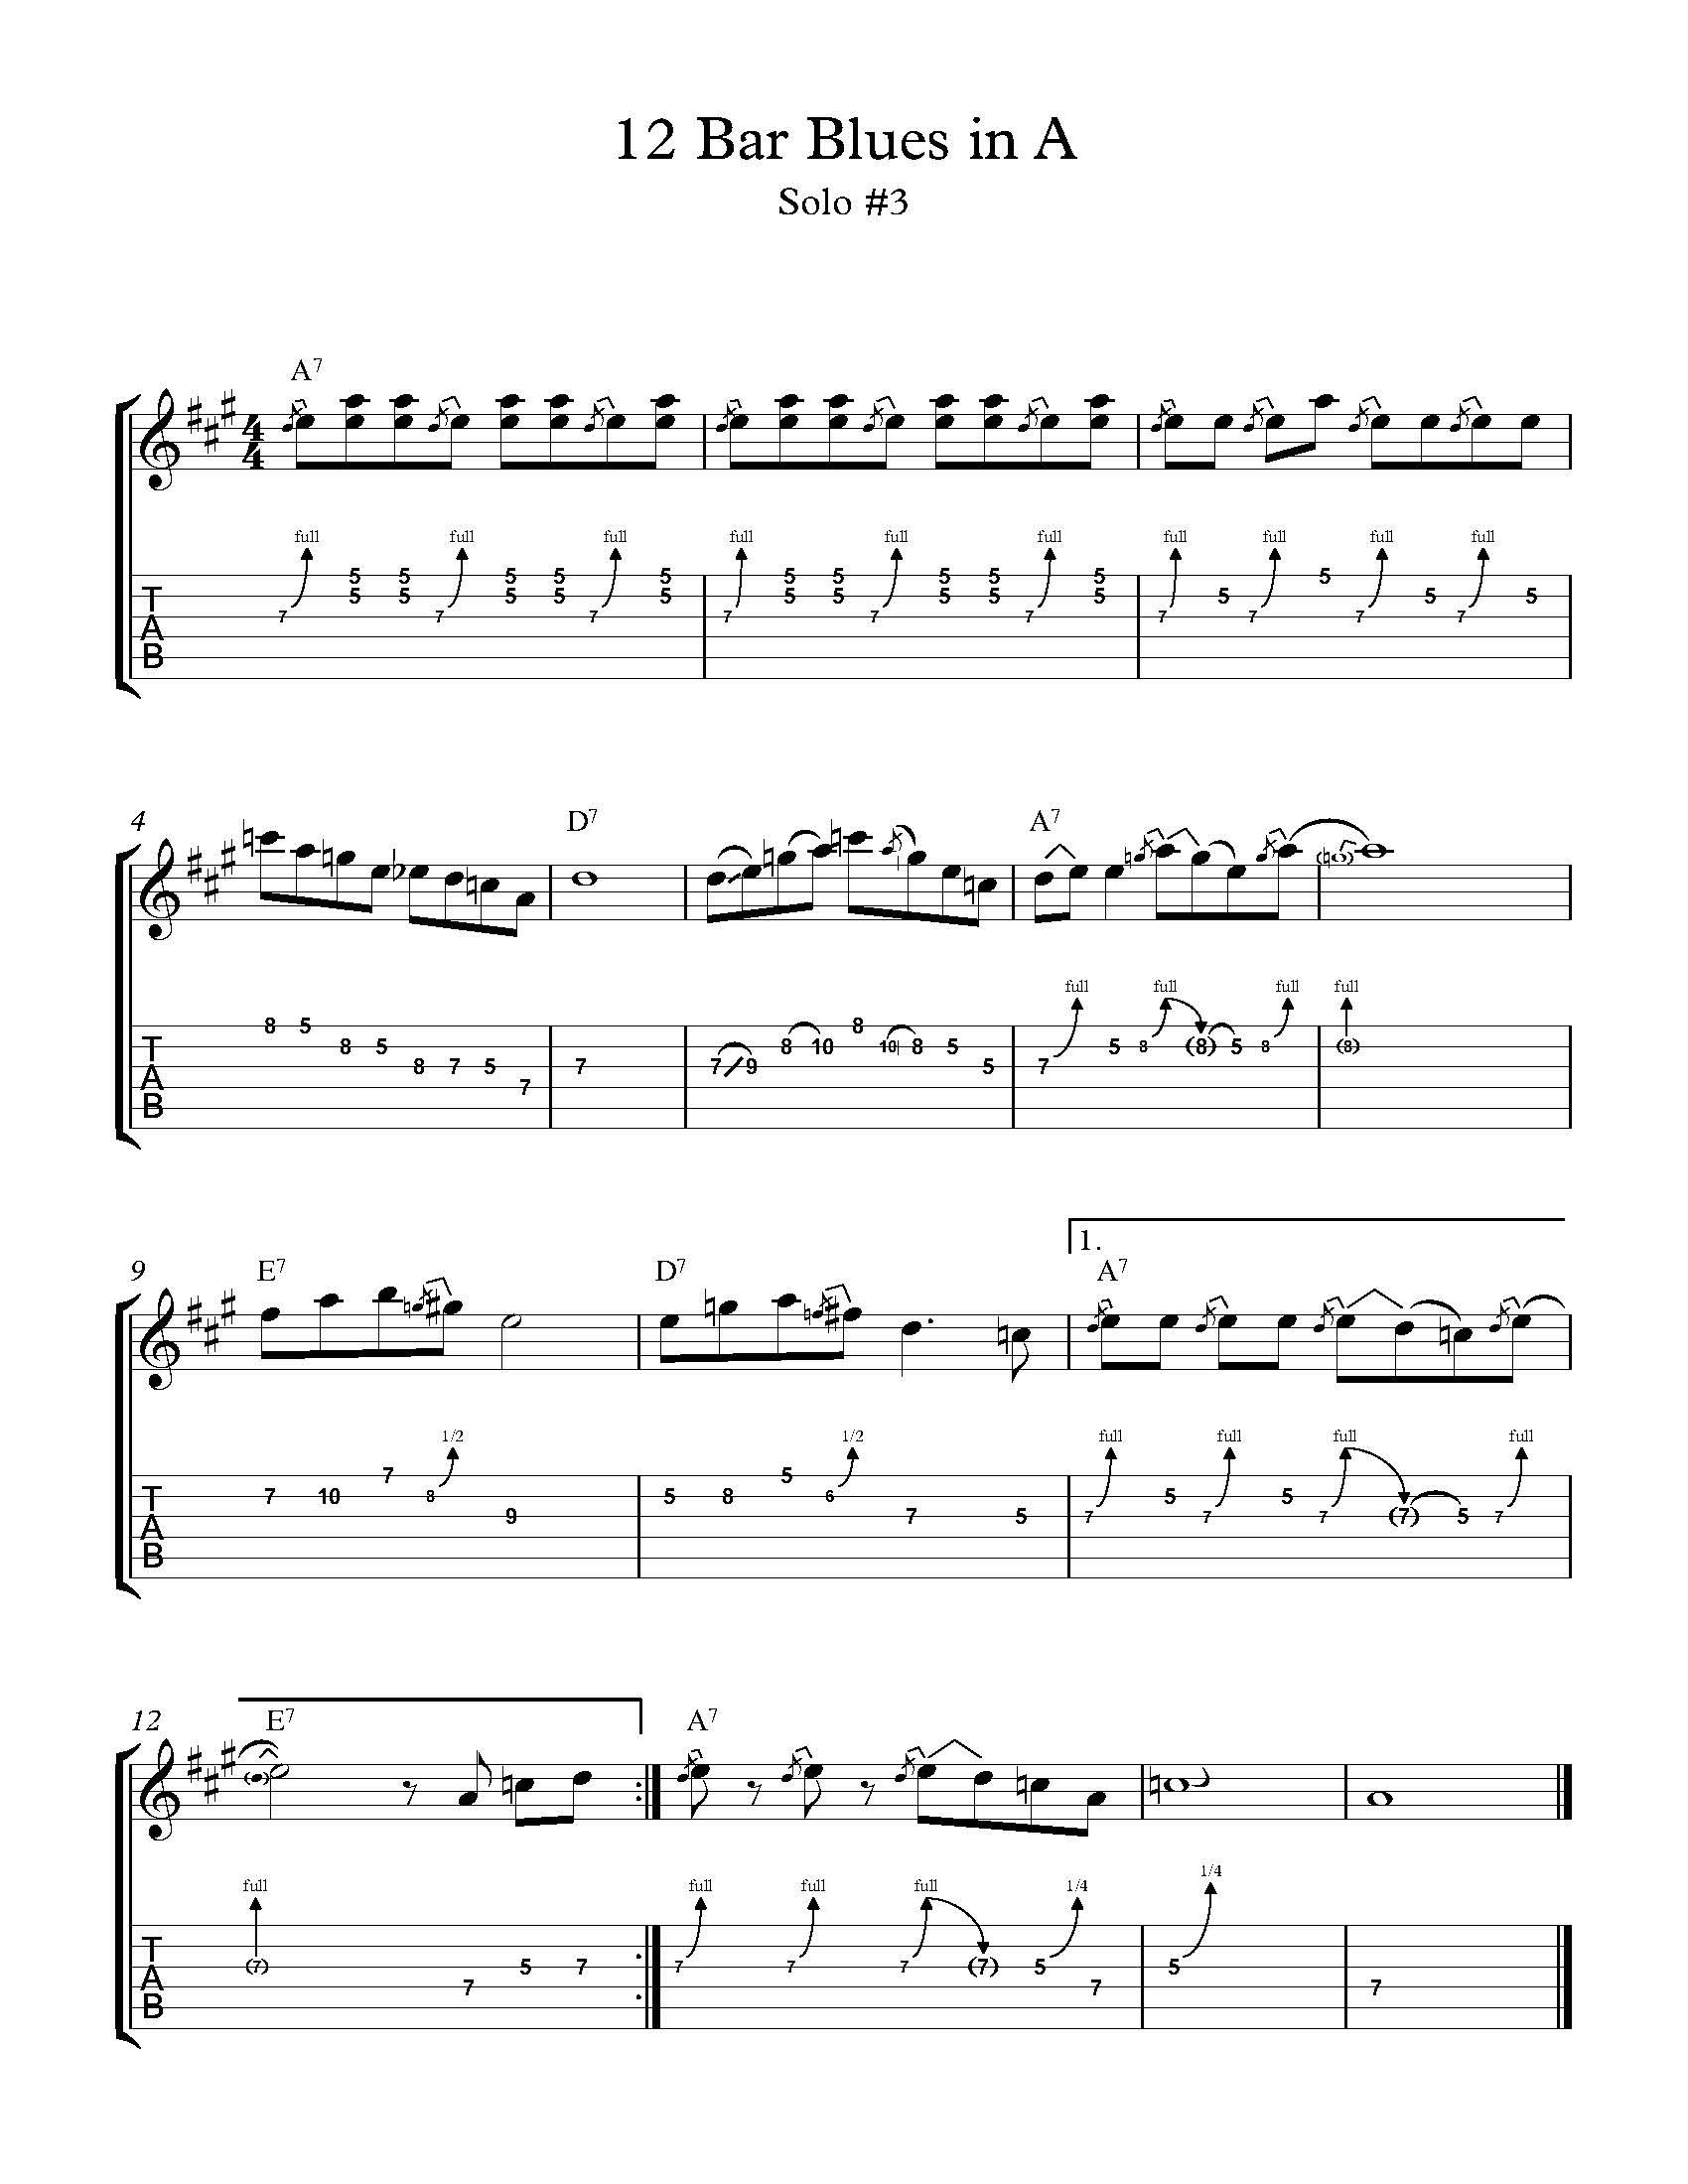 12 Bar Blues In A Solo #3 - Teacher of Guitar